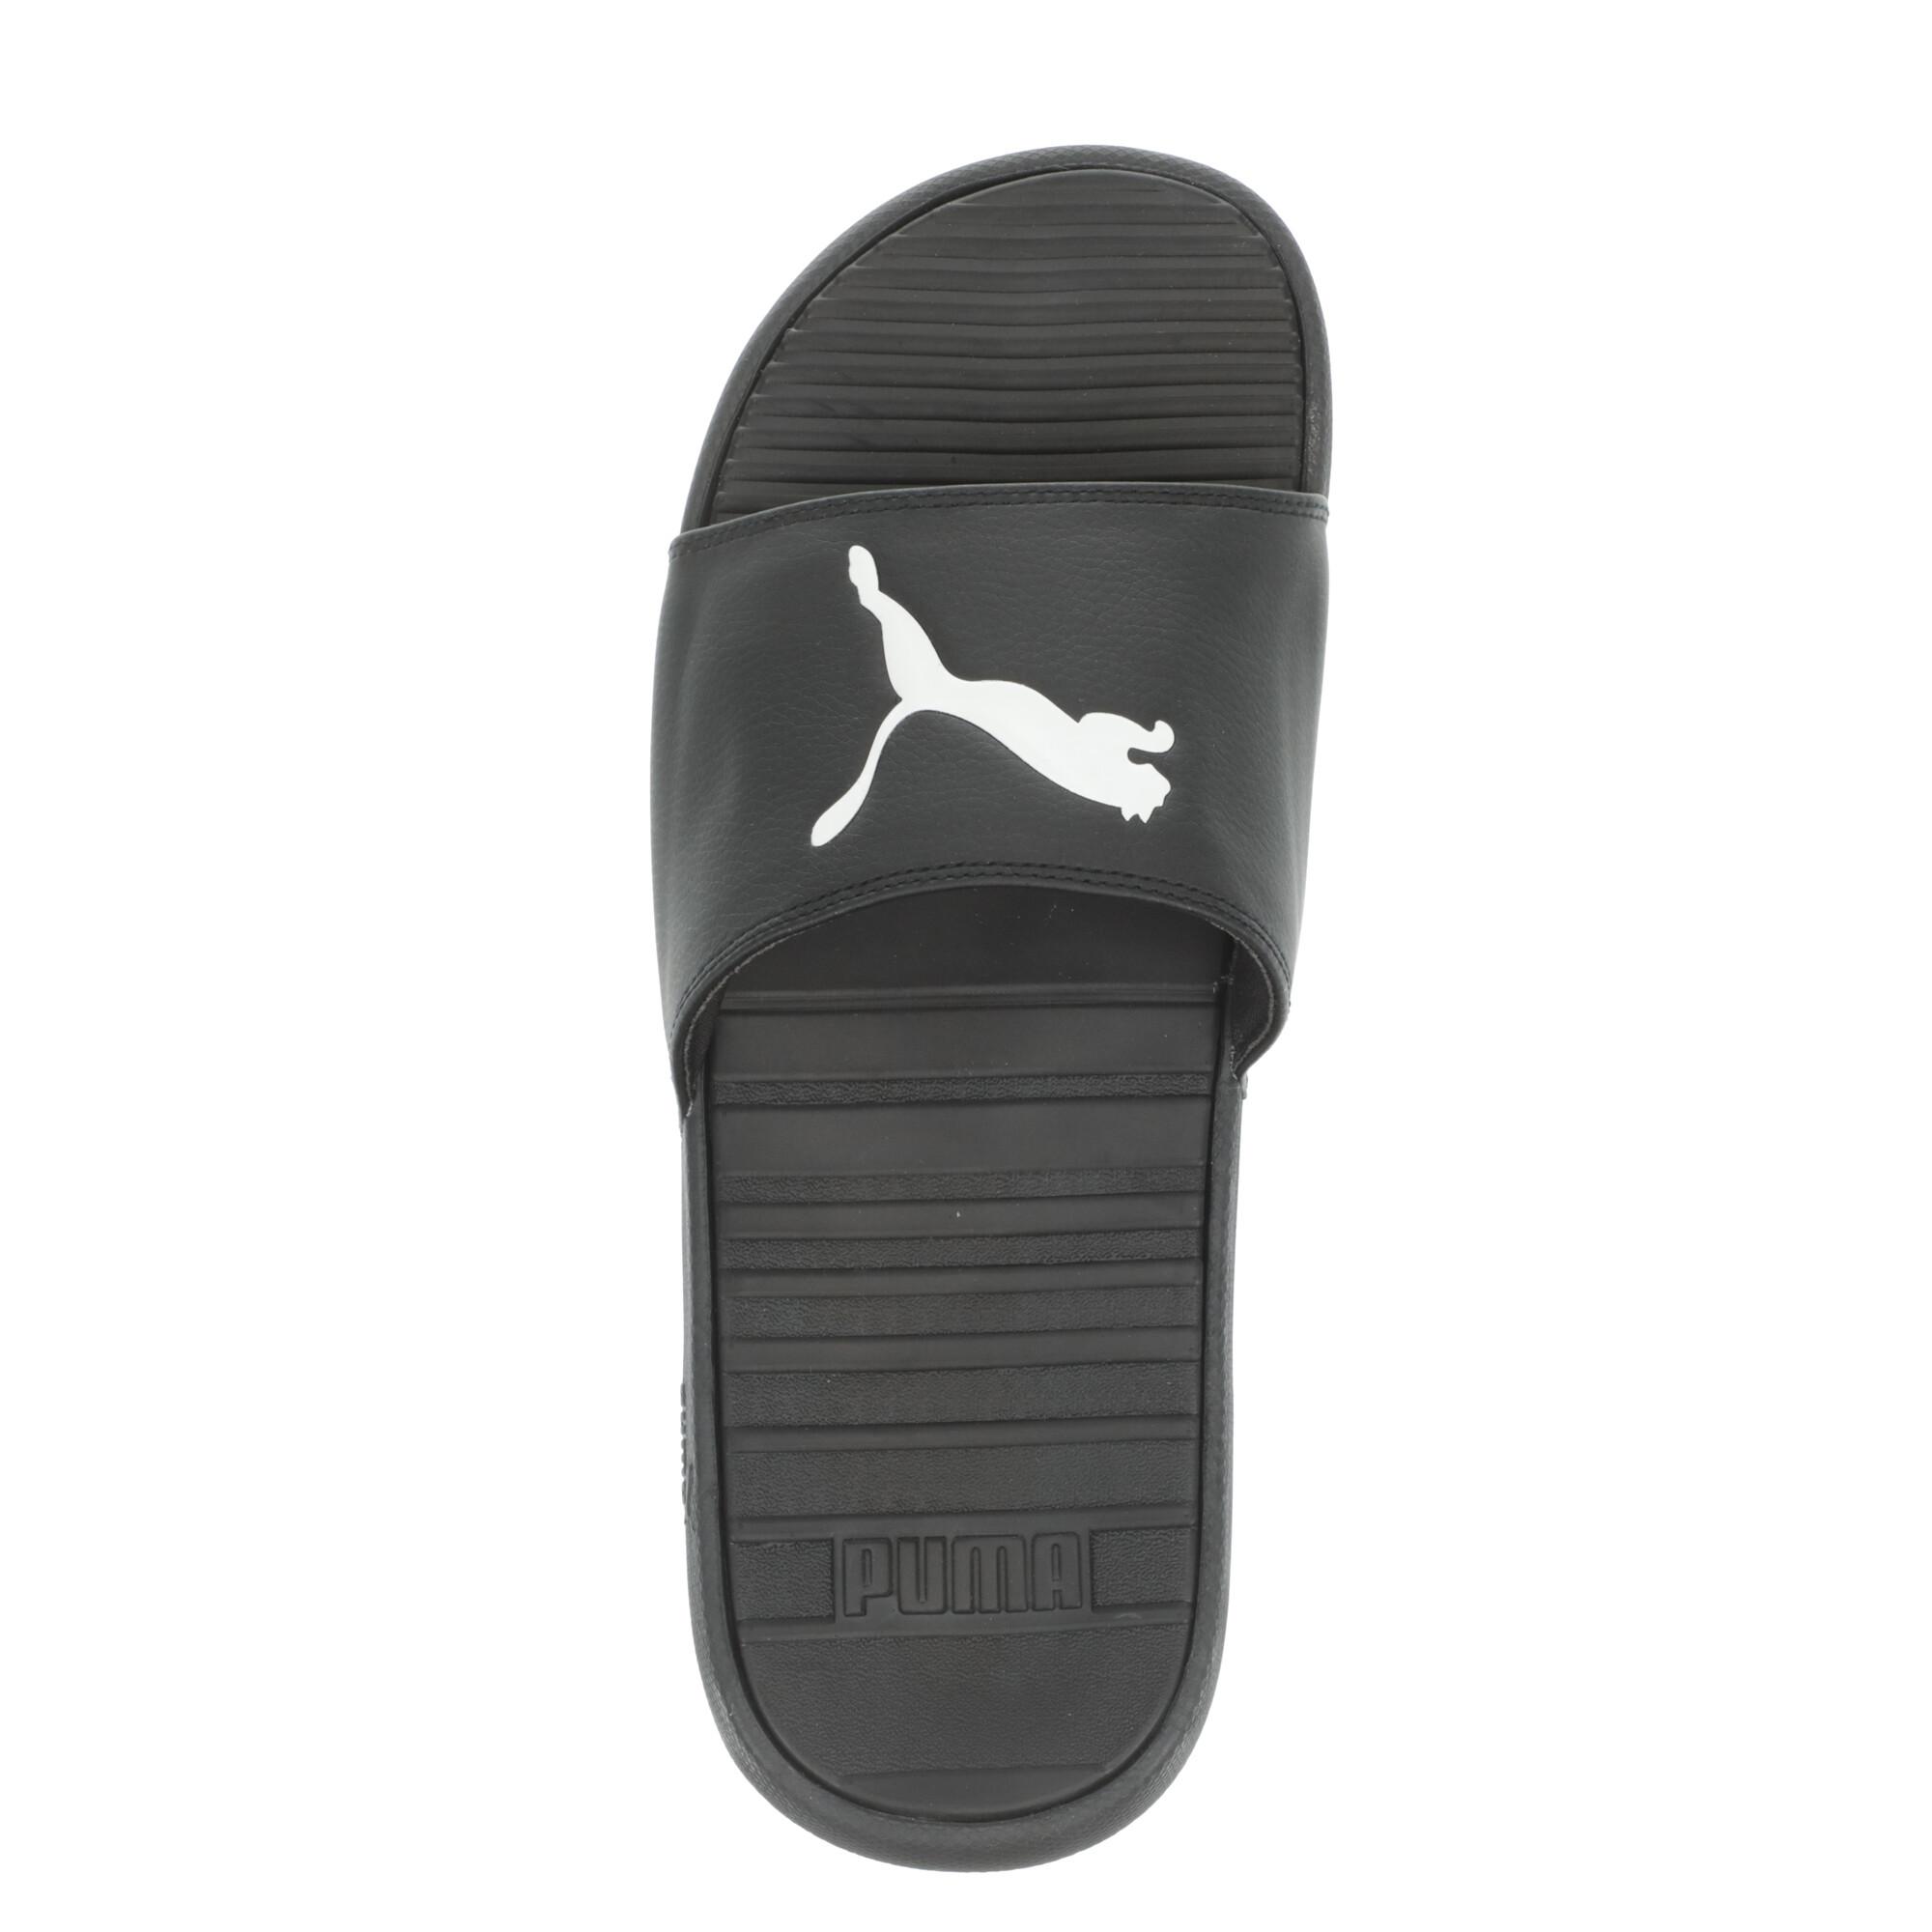 PUMA-Cool-Cat-Sport-Men-039-s-Slides-Men-Sandal-Swimming-Beach thumbnail 6